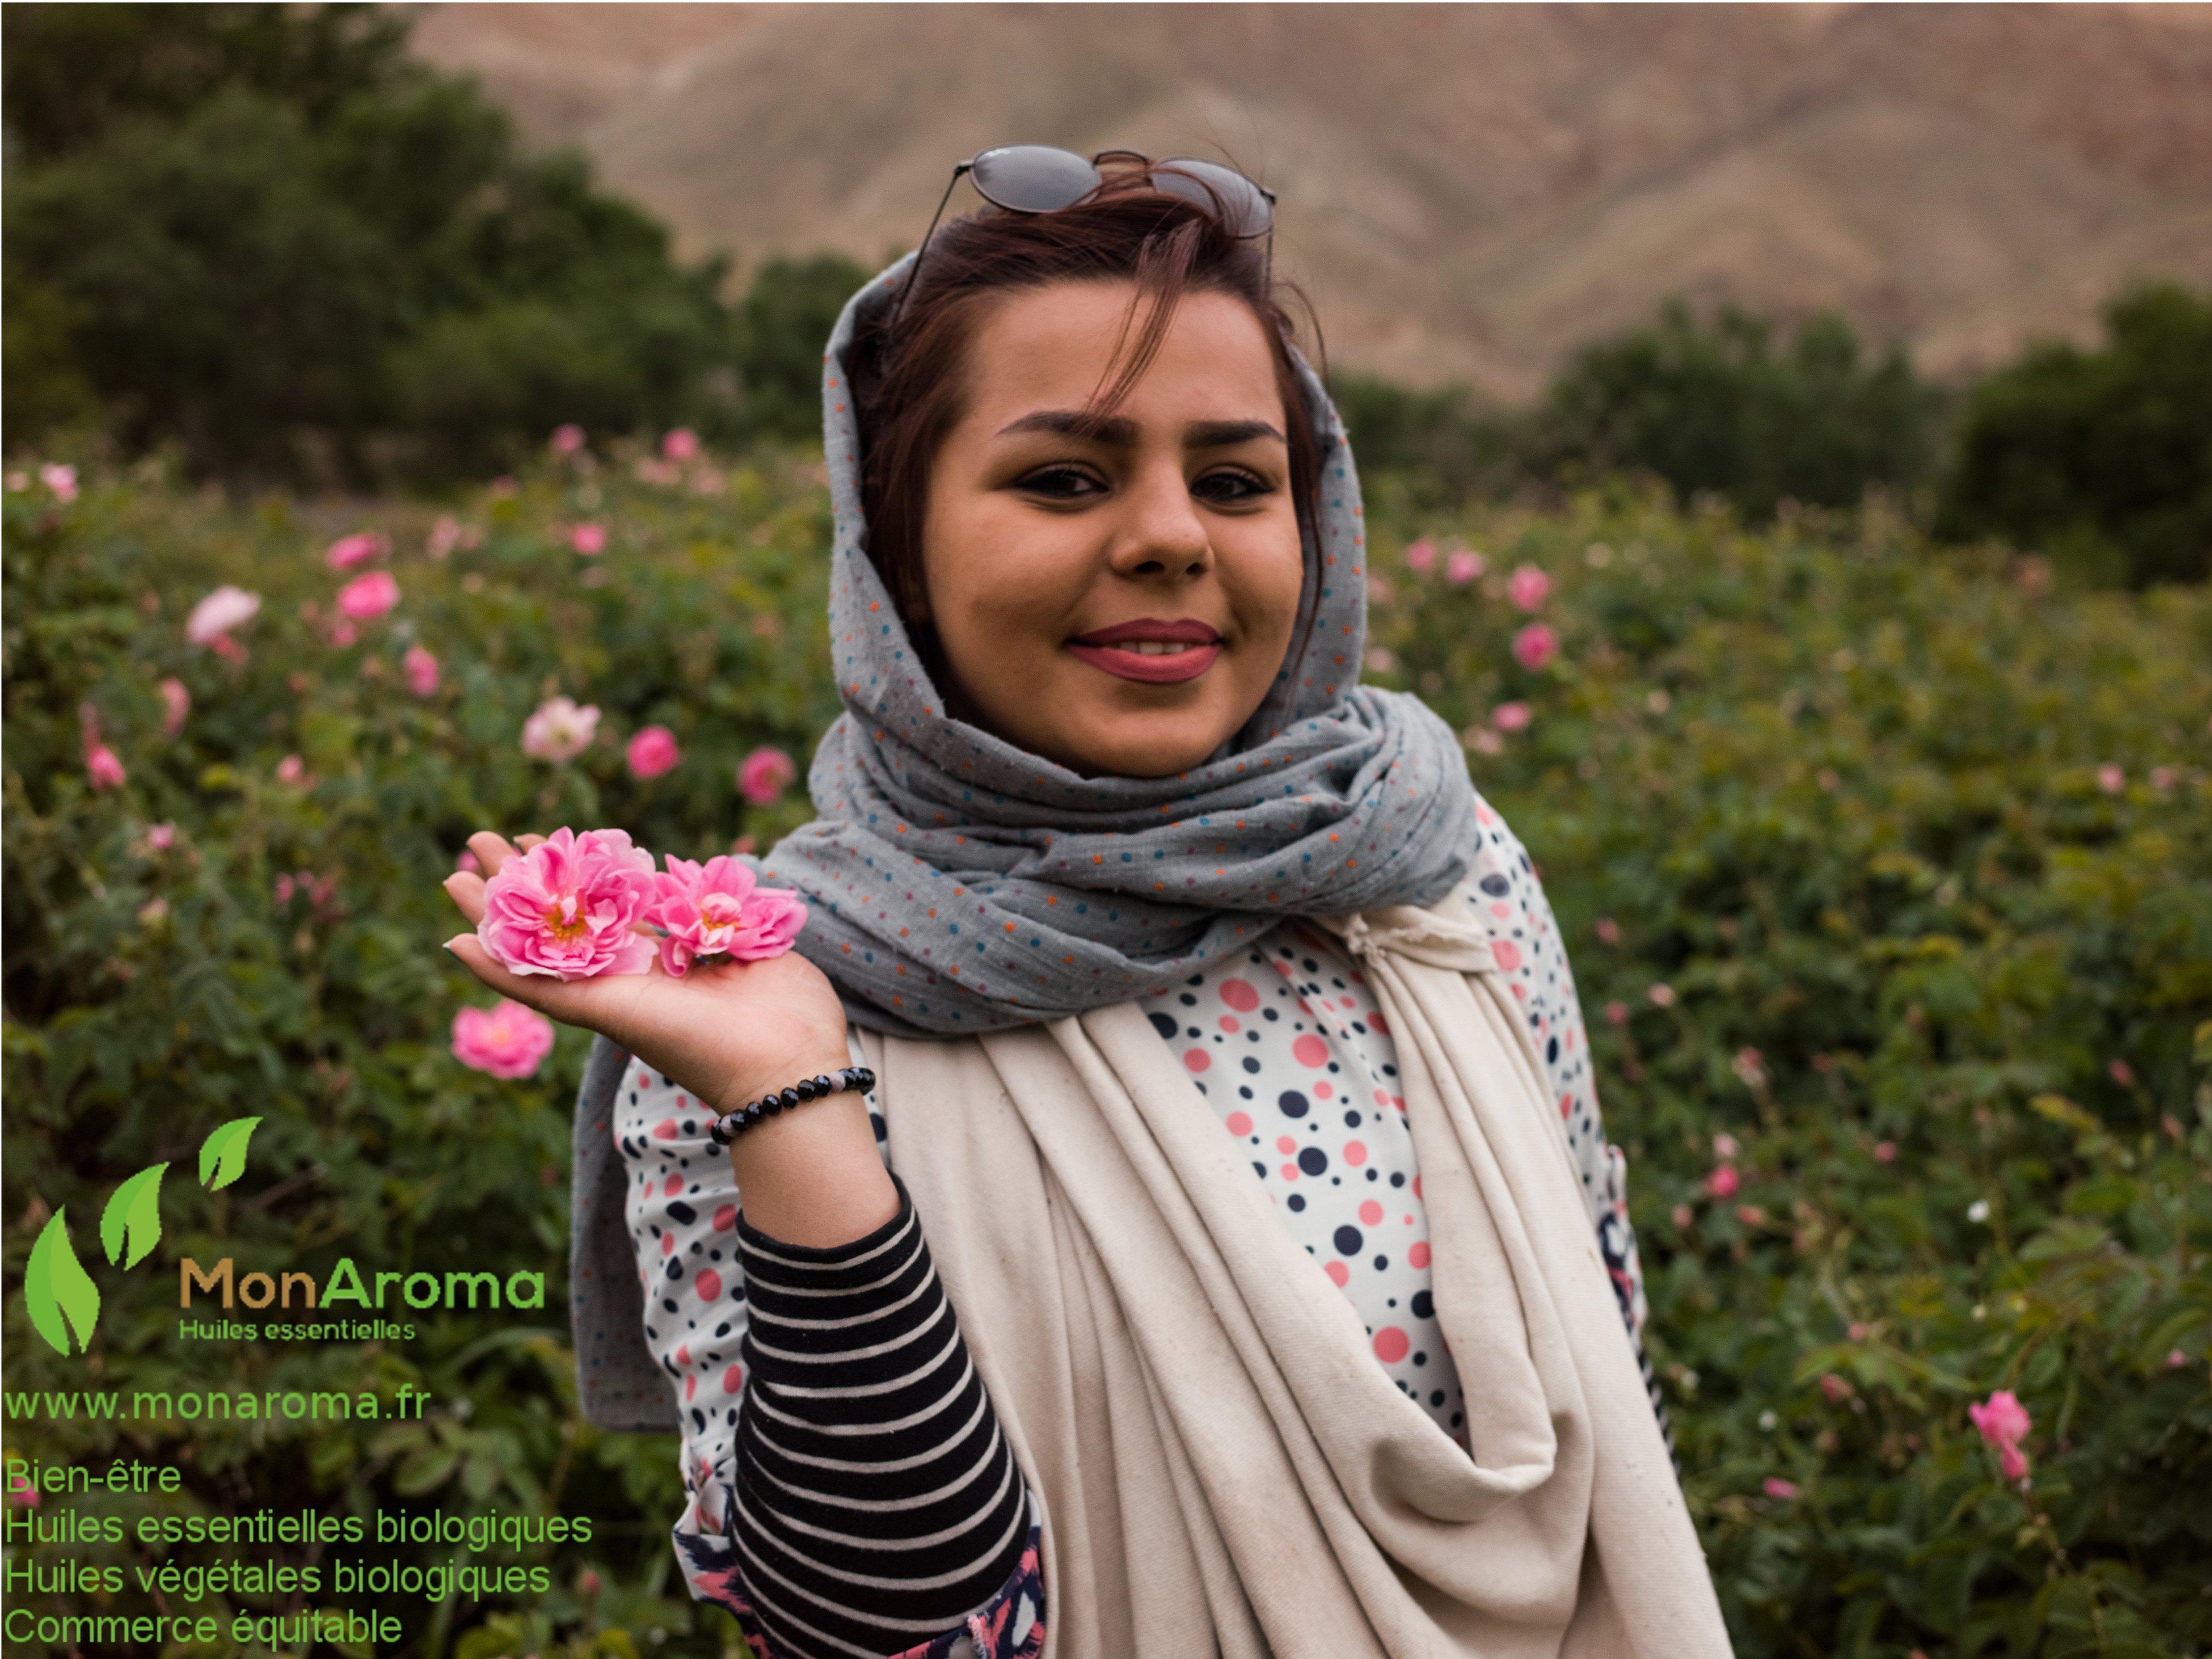 Jeune fille aux roses avec Logo MonAroma